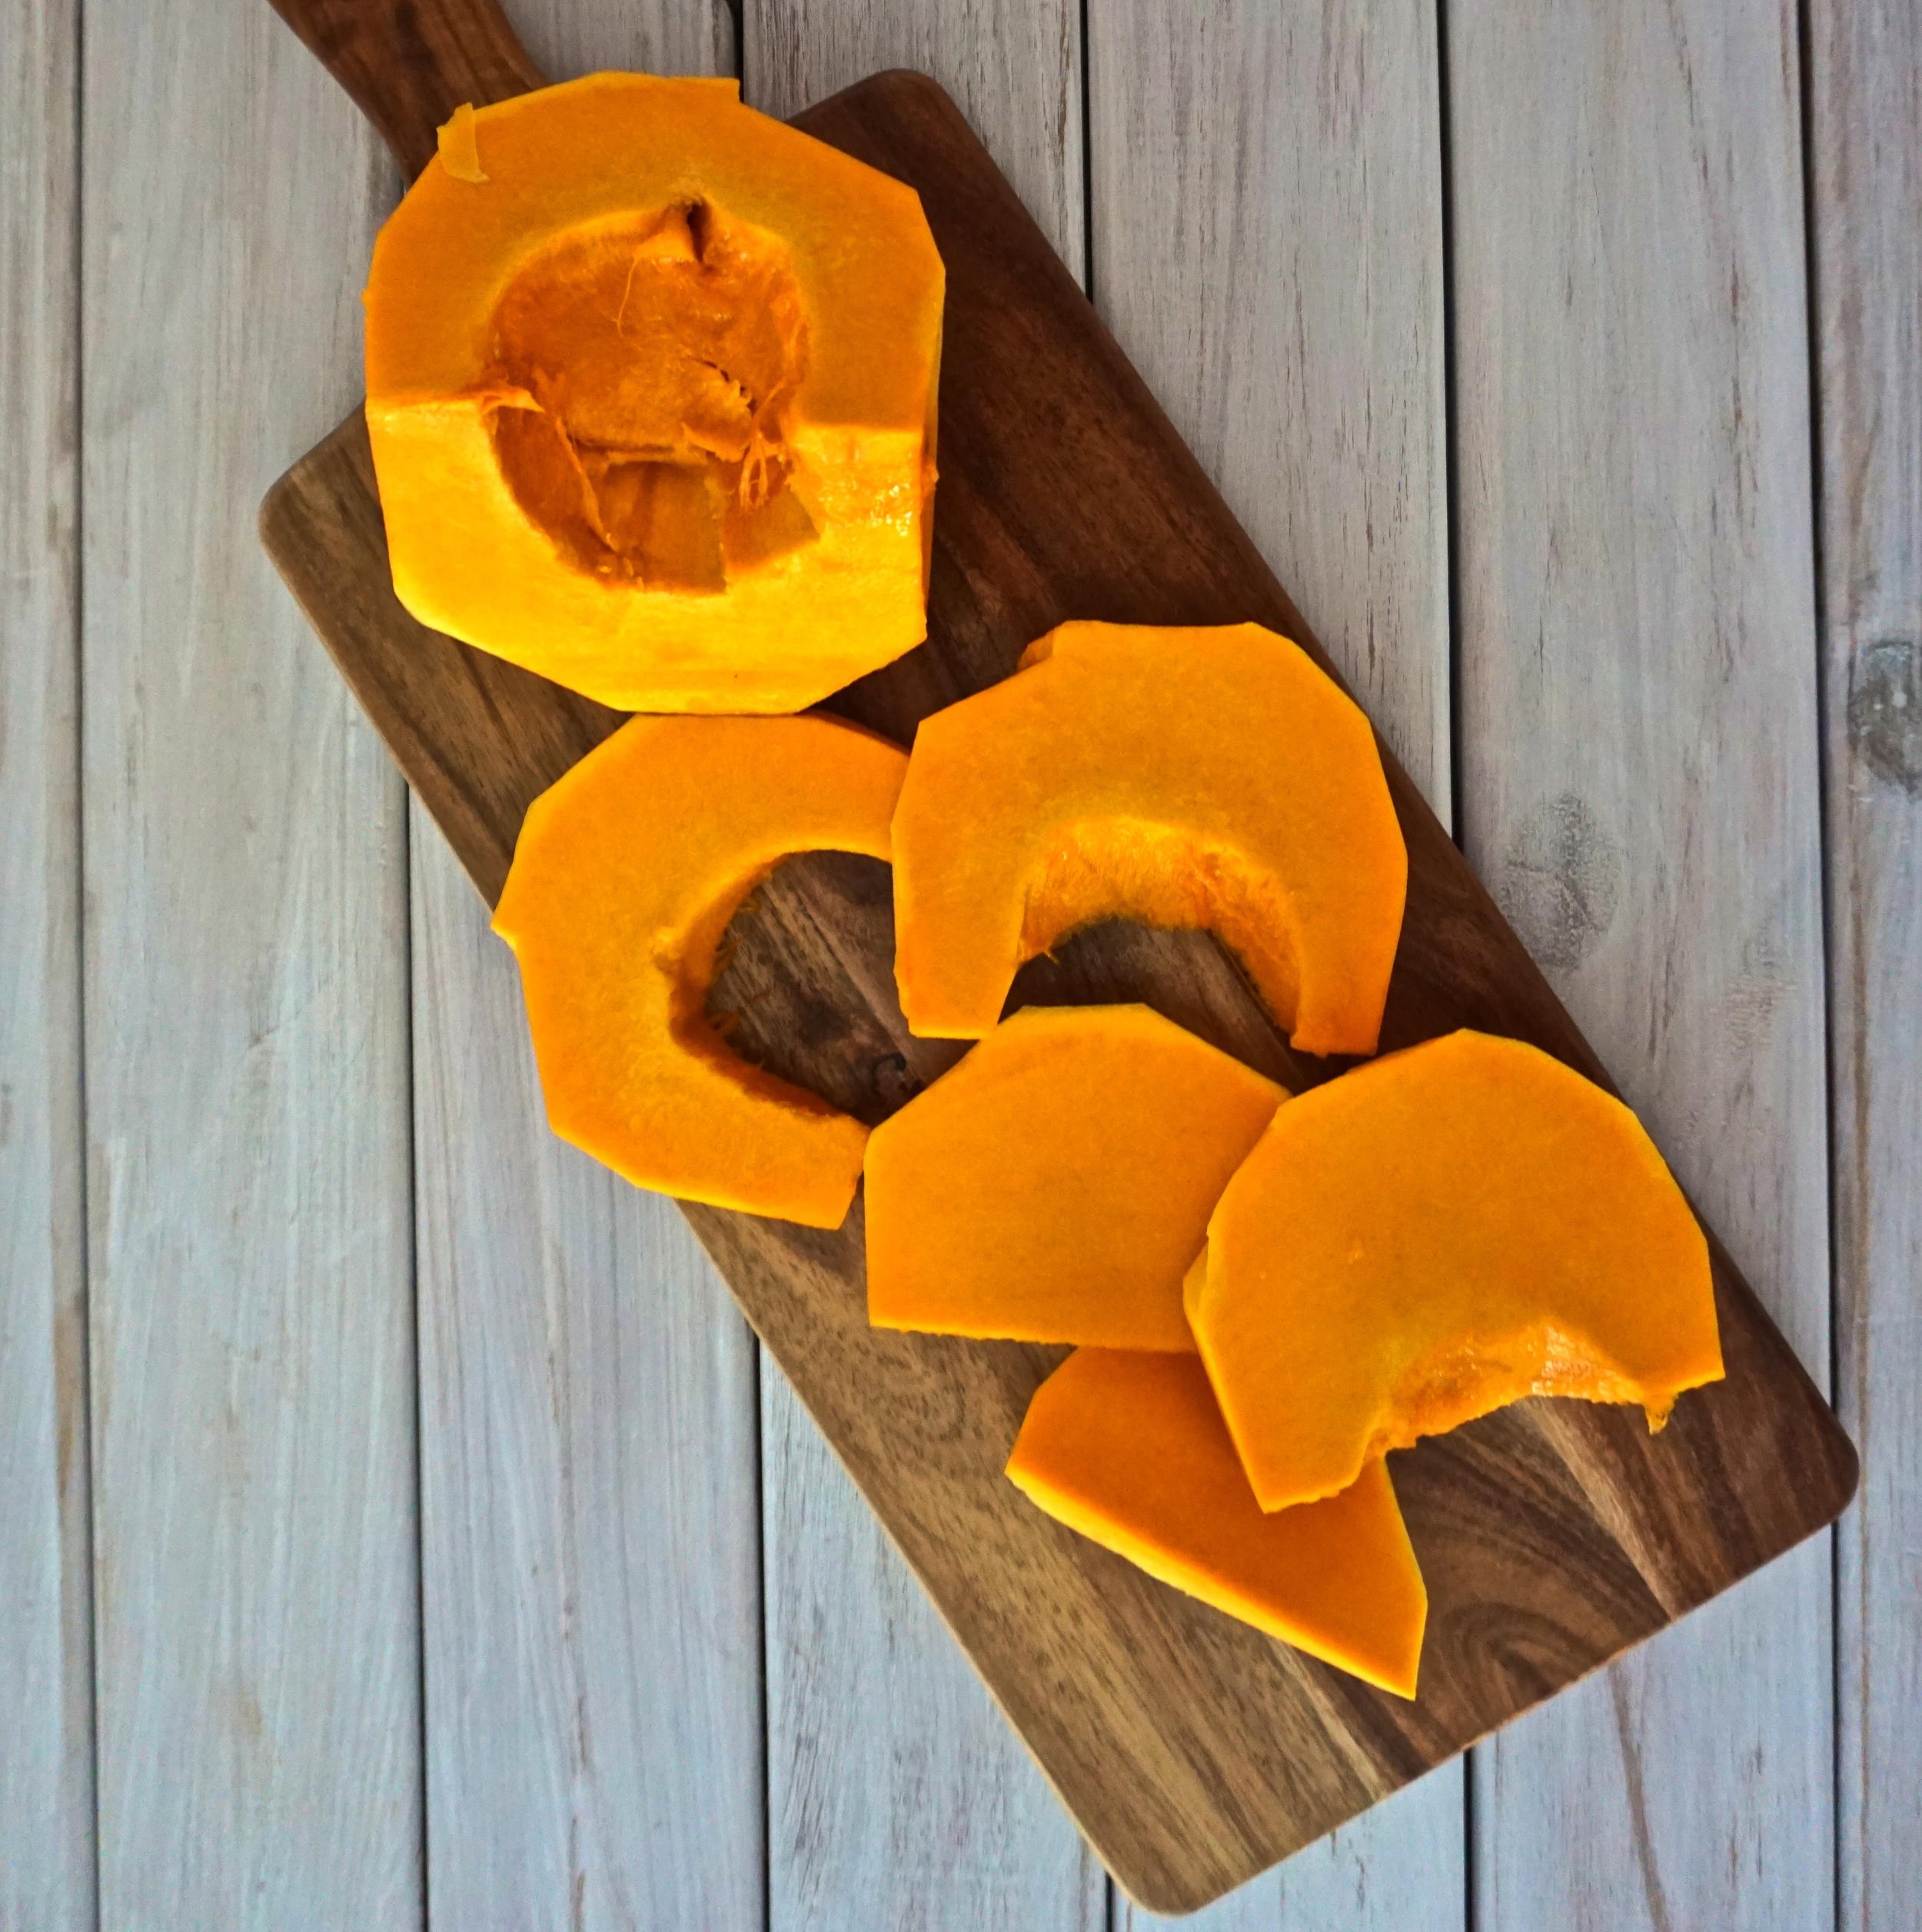 Delicious sliced pumpkin on wood chopping board